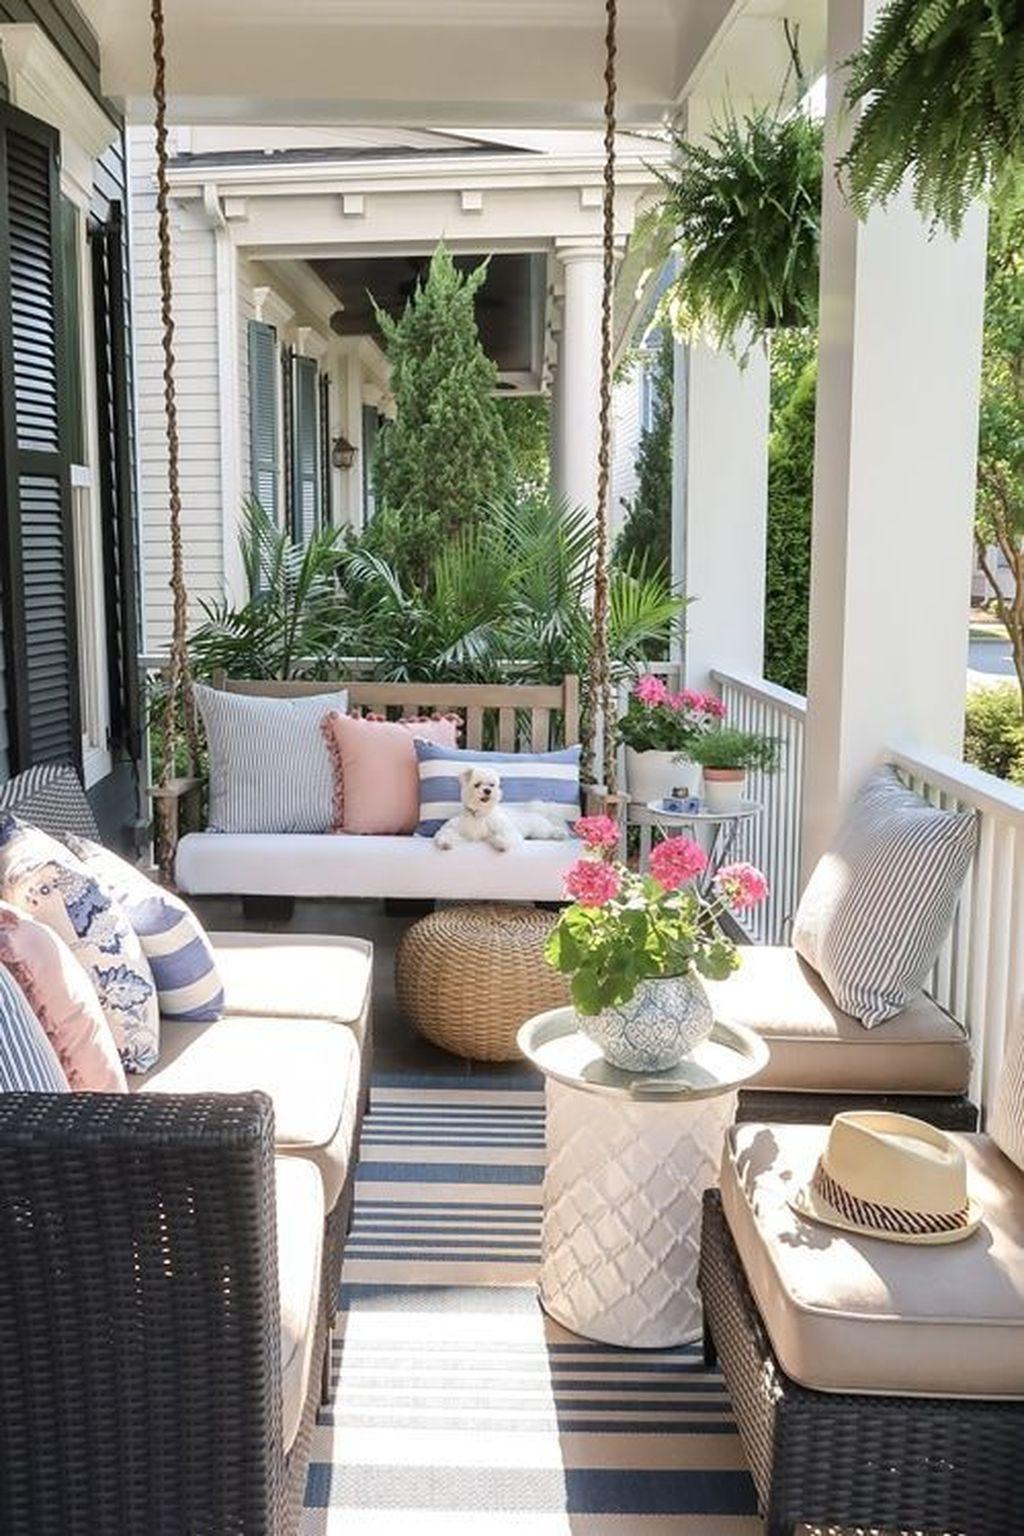 Best Minimalist Furniture Design Ideas For Your Outdoor Area 09